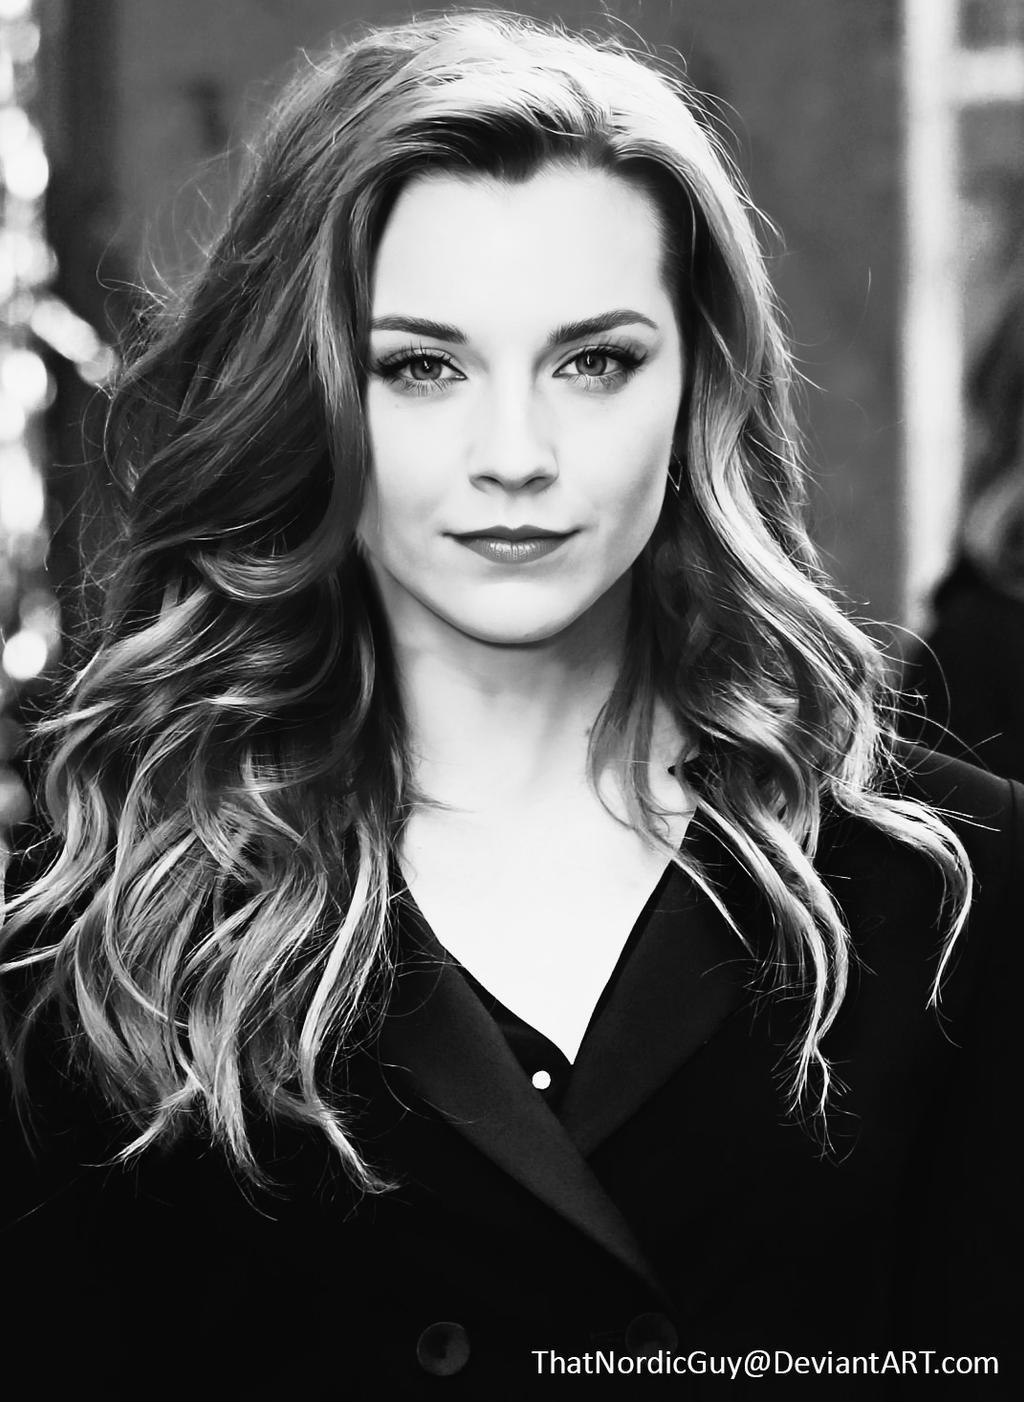 Natalie Dormer / Emma Watson [Black and White] by ThatNordicGuy